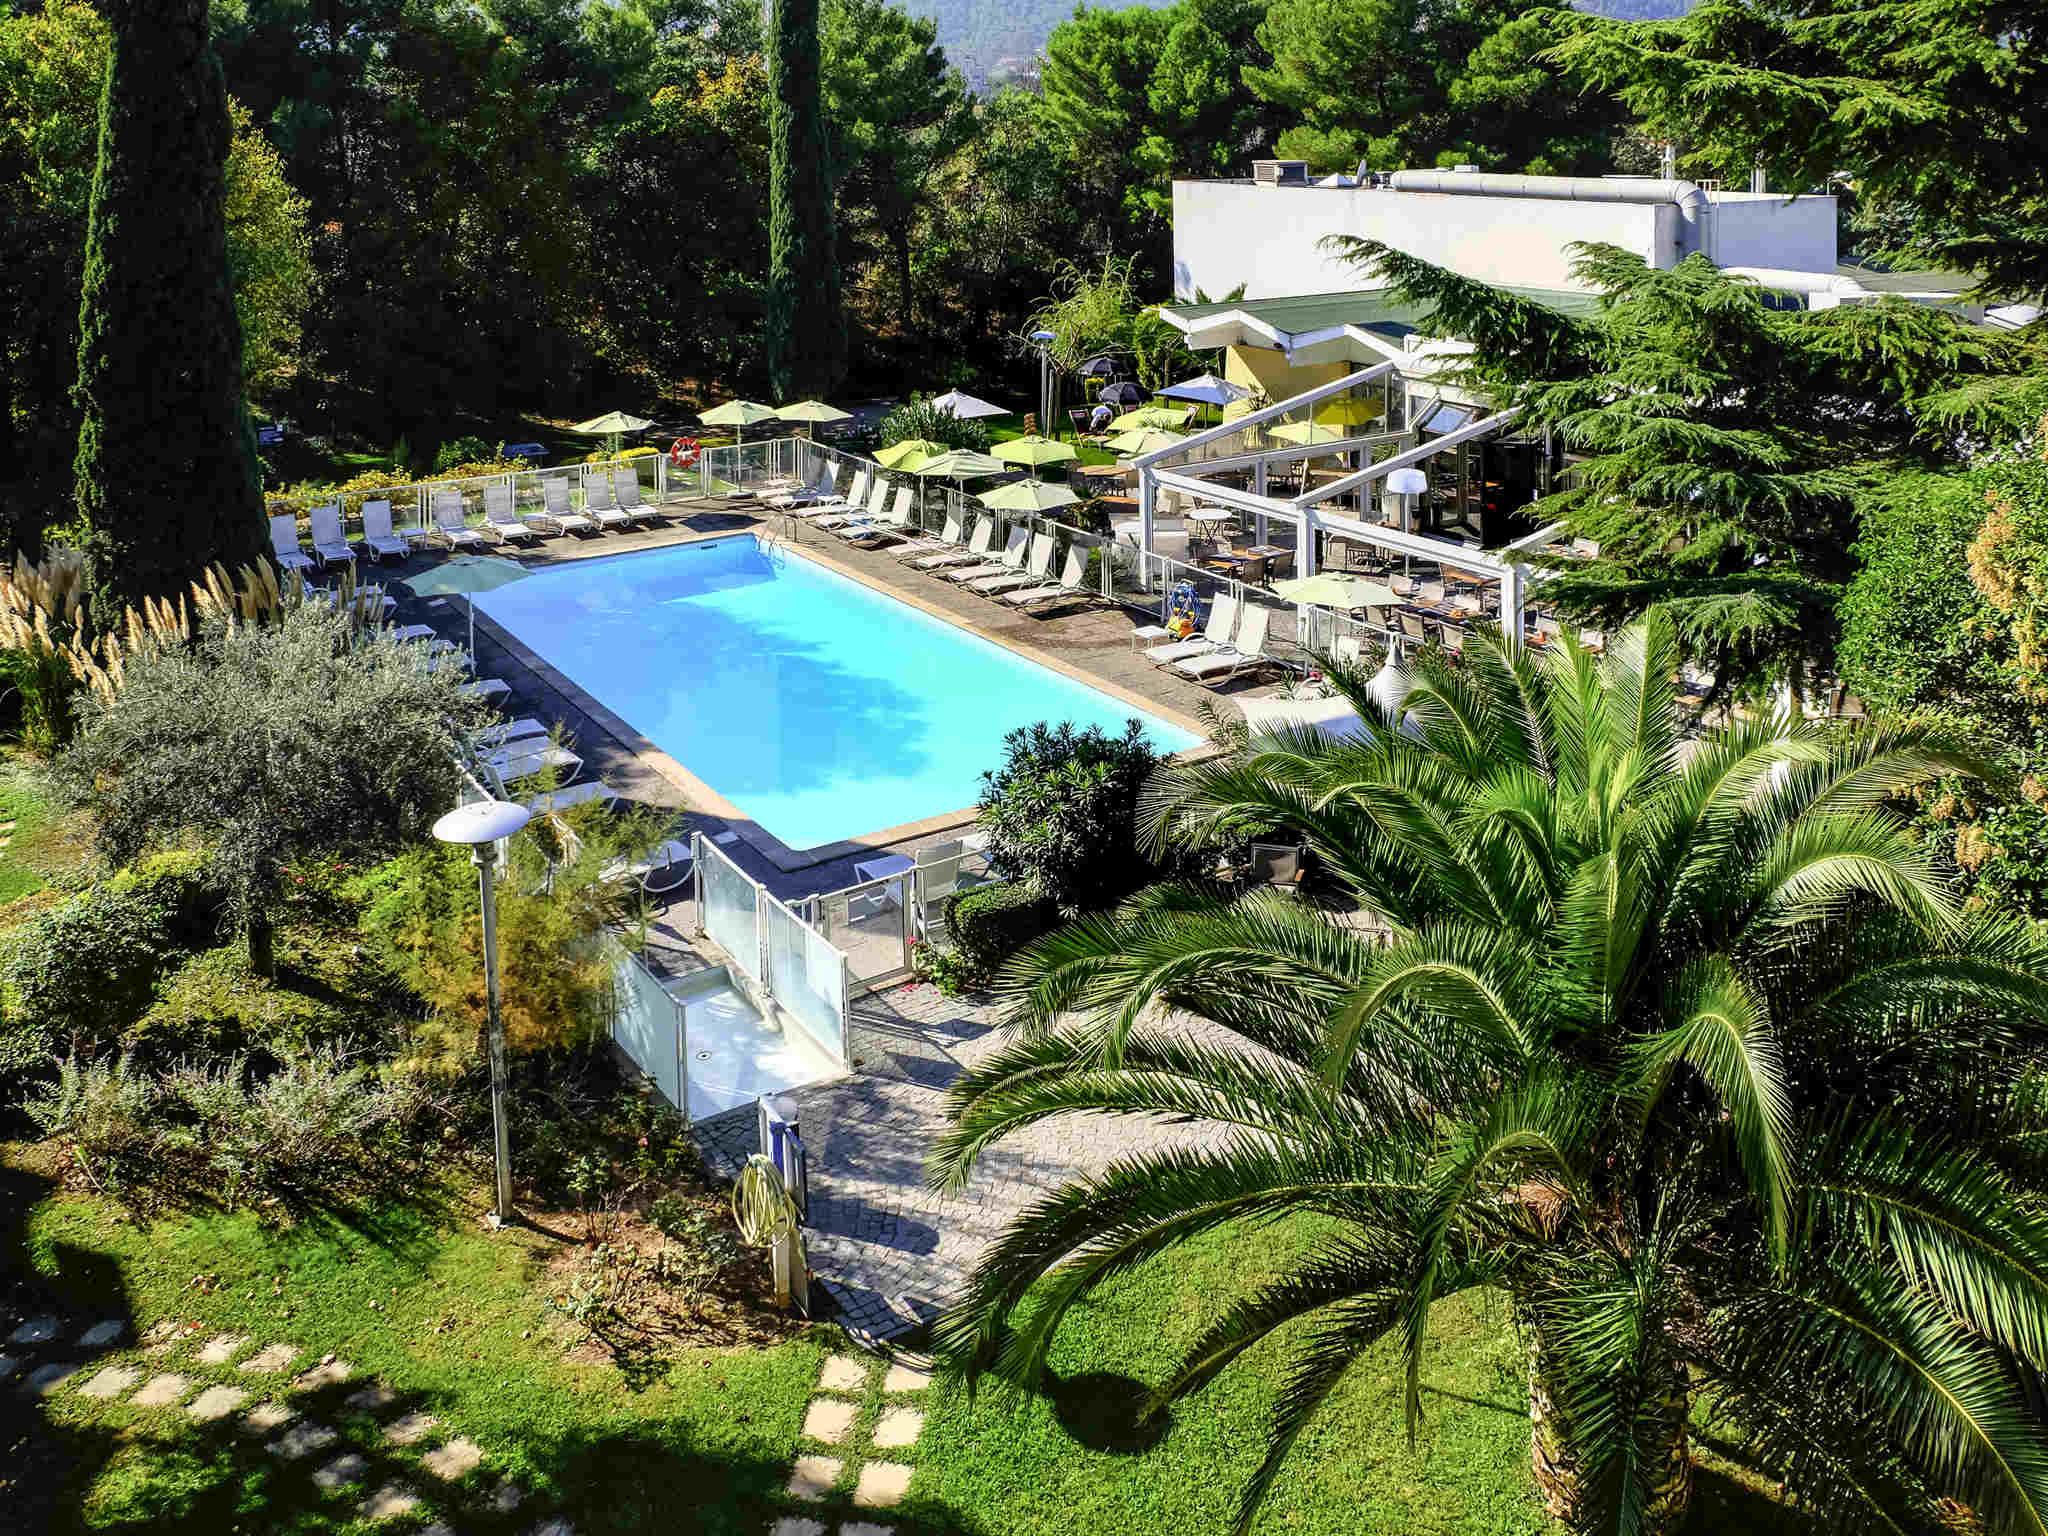 Hotel – Novotel Marsiglia Est